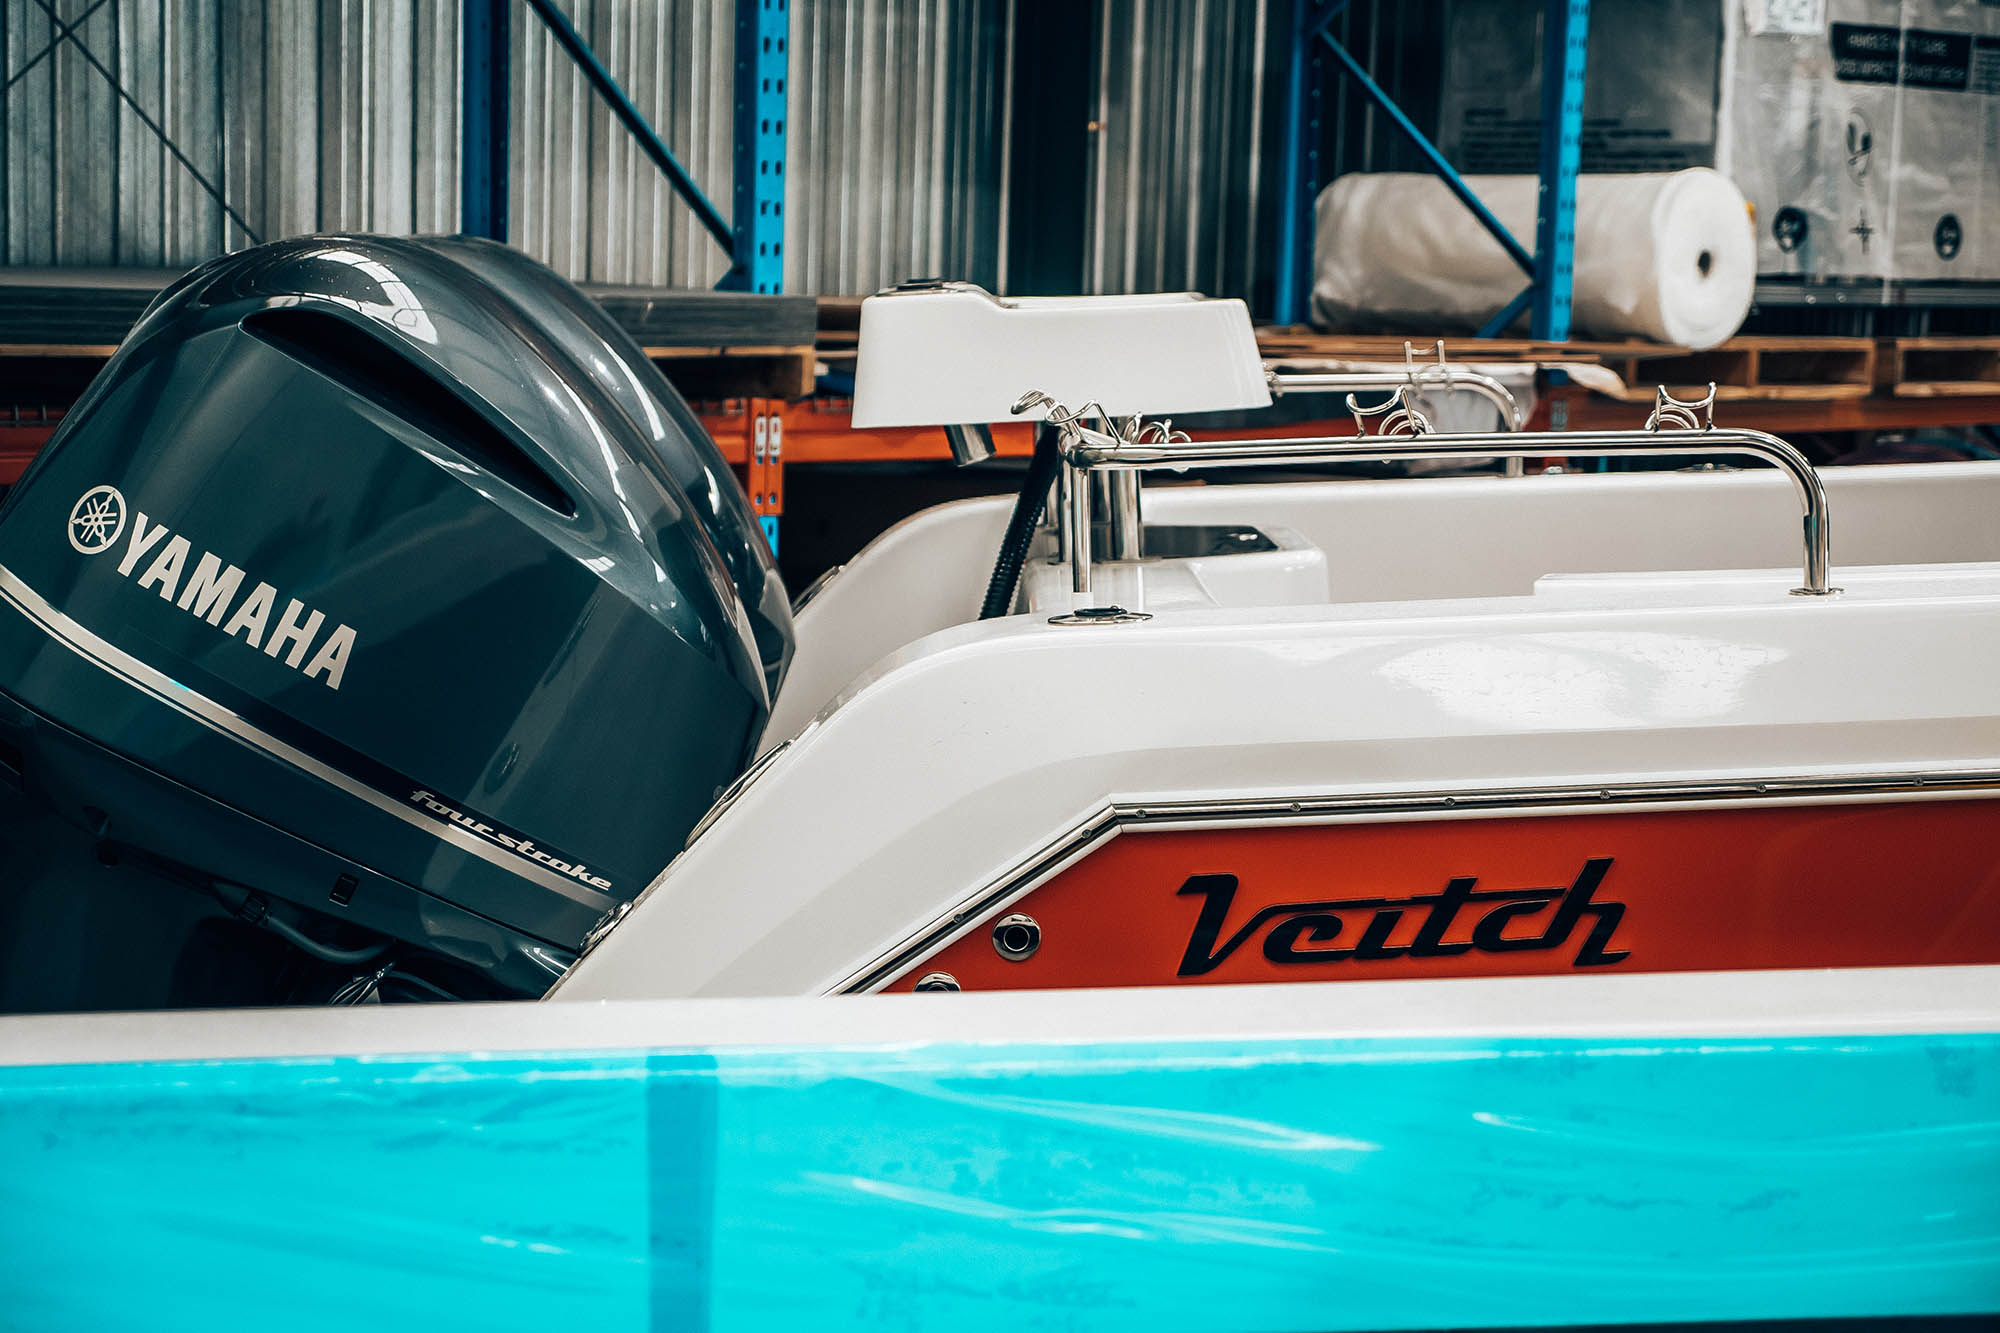 veitch-boat-27-30